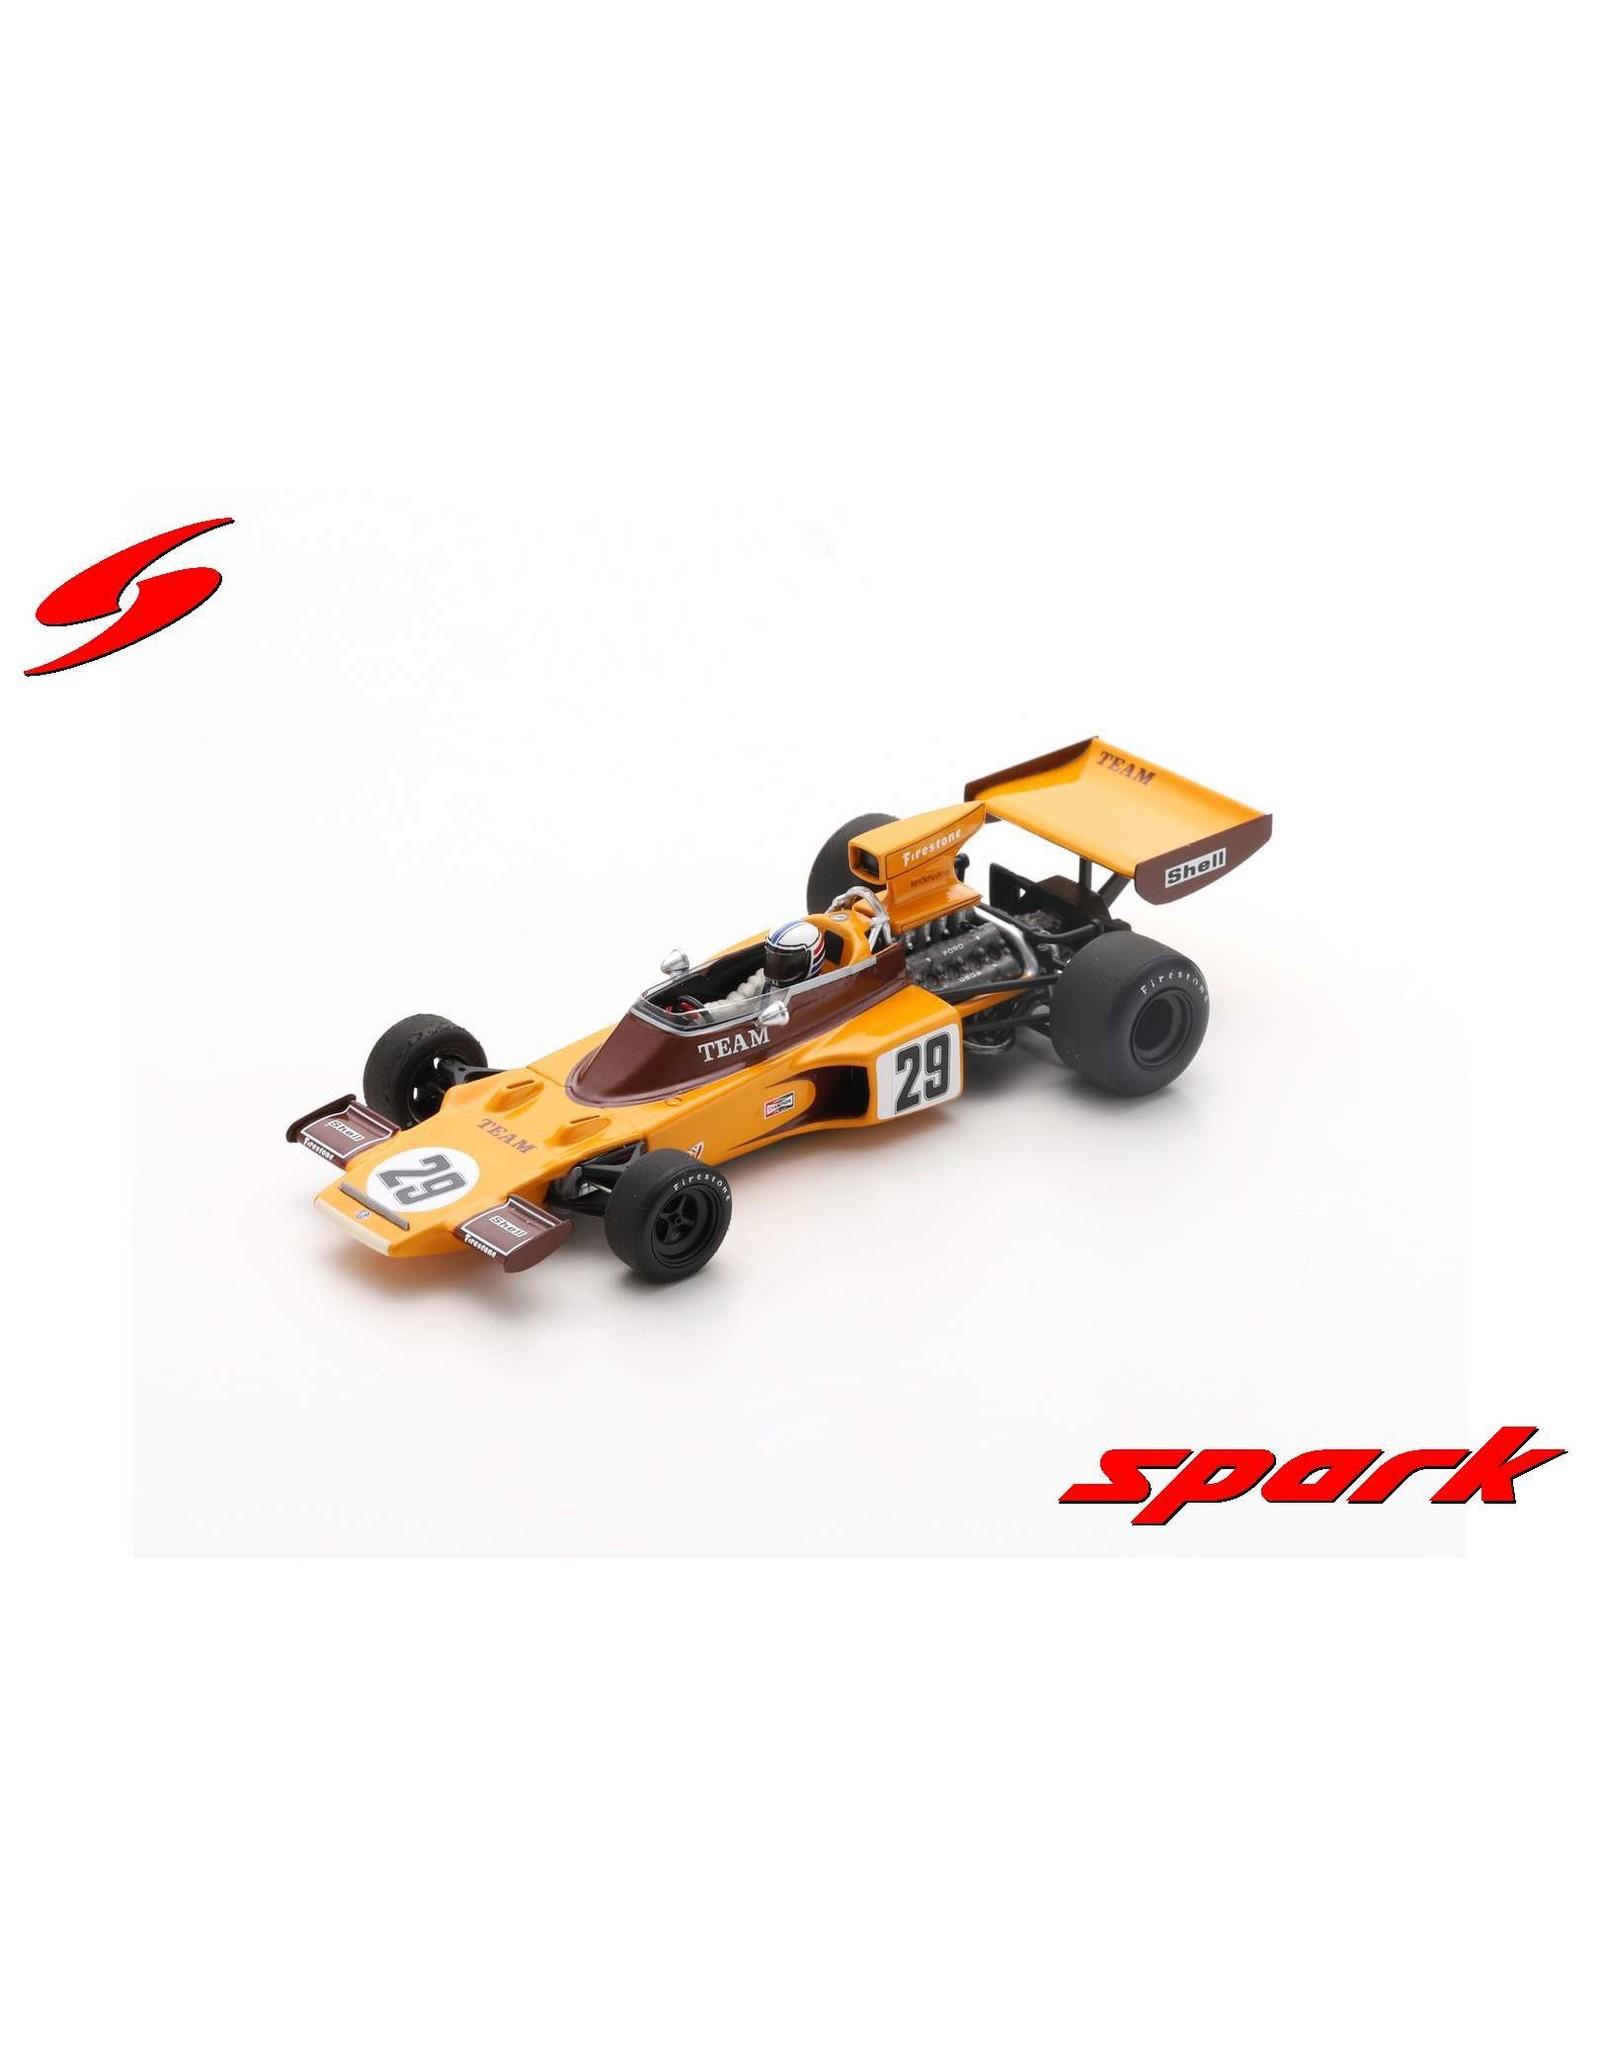 Formule 1 Formule 1 Lotus 72E #29 GP South Africa 1974 - 1:43 - Spark